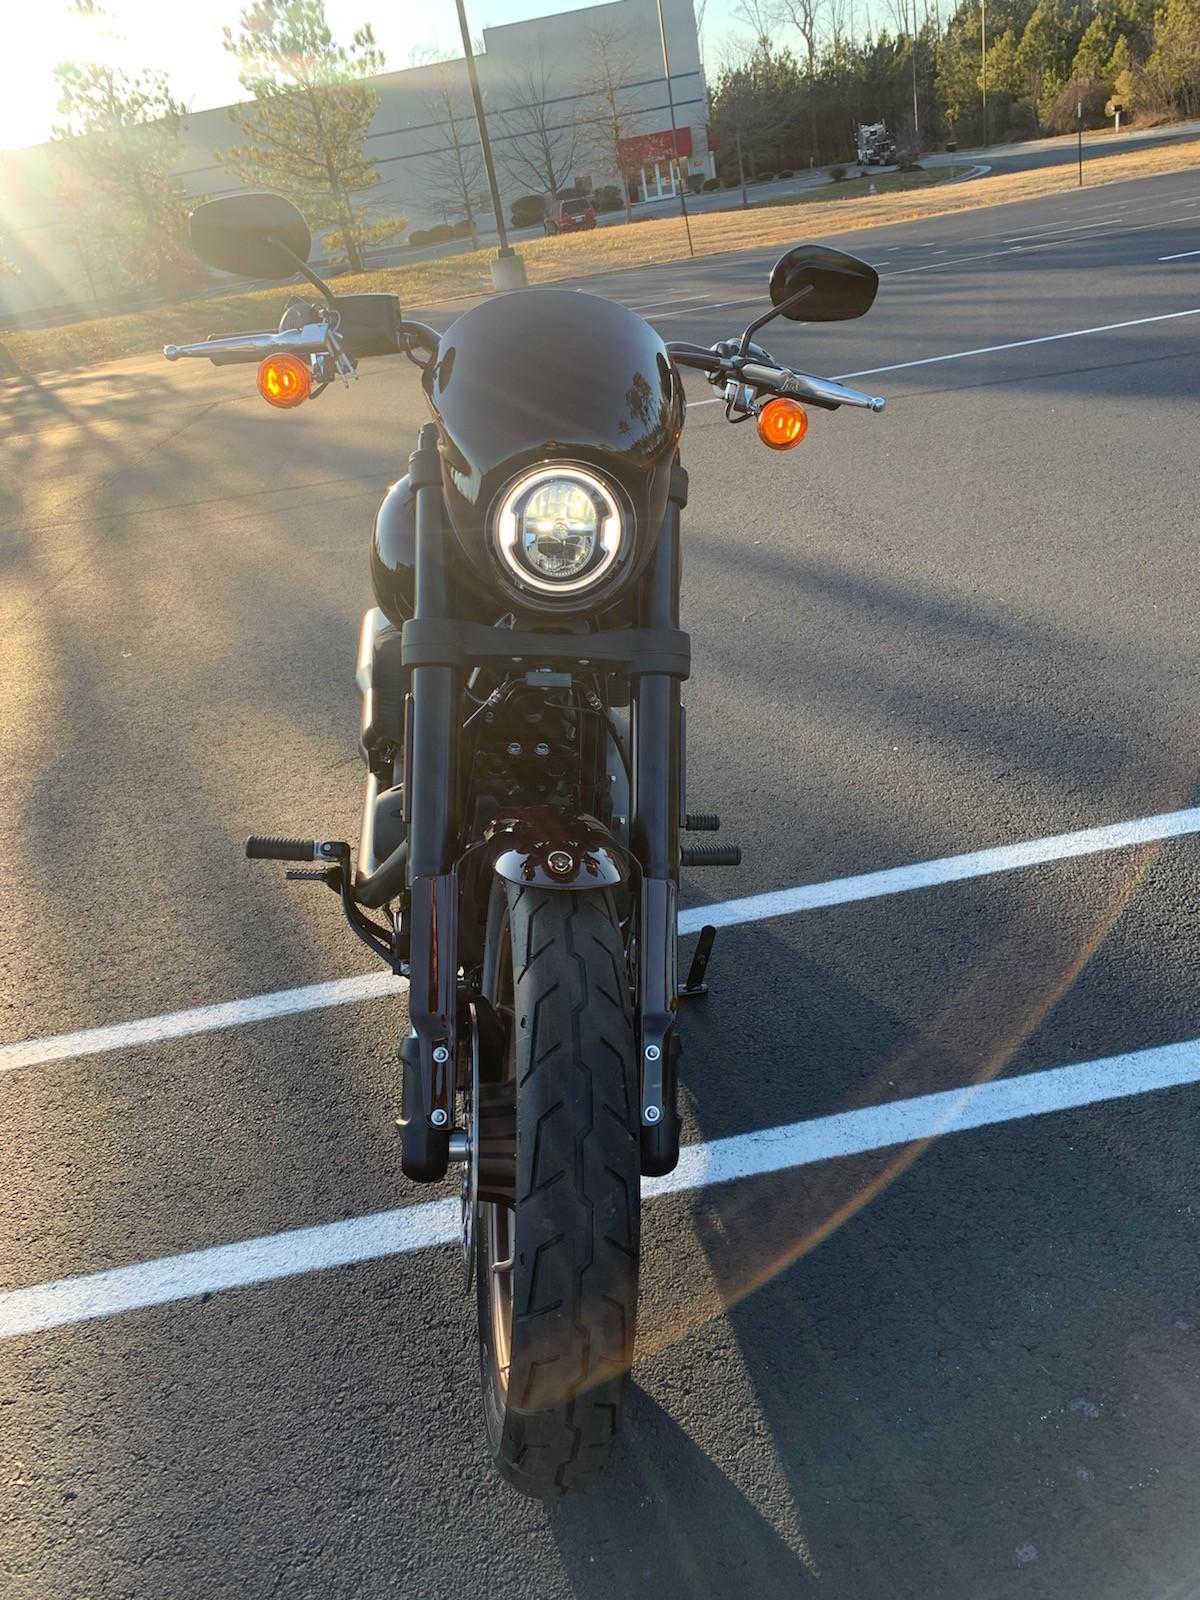 2021 Harley-Davidson Cruiser FXLRS Low Rider S at Richmond Harley-Davidson